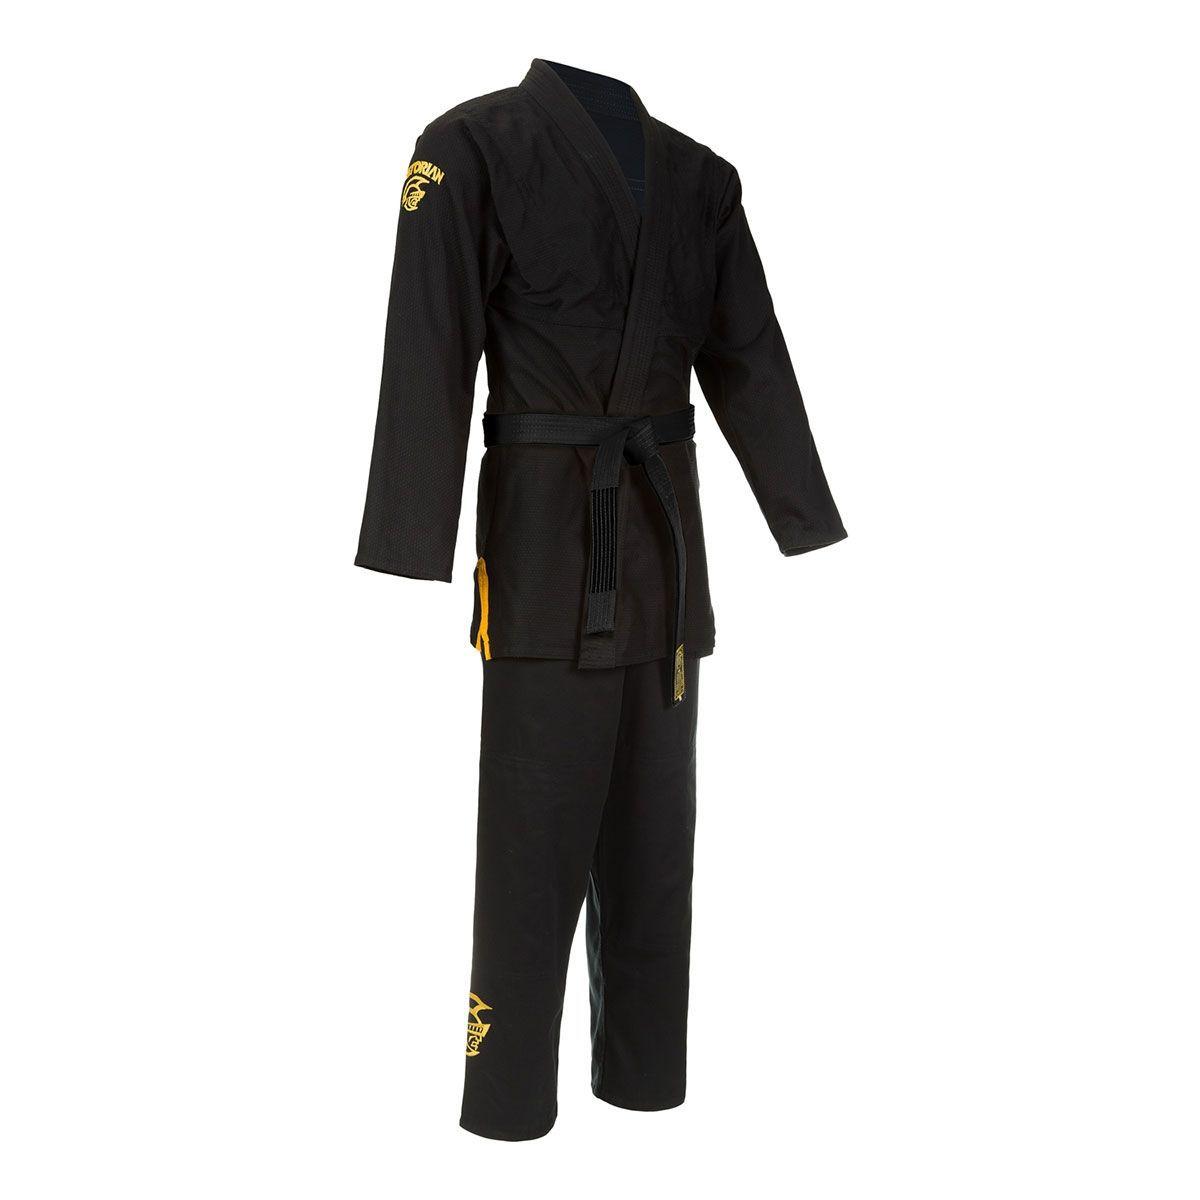 Kimono Jiu Jitsu - Trançado Leve - Adulto - Elite Training - Pretorian - Preto  - Loja do Competidor